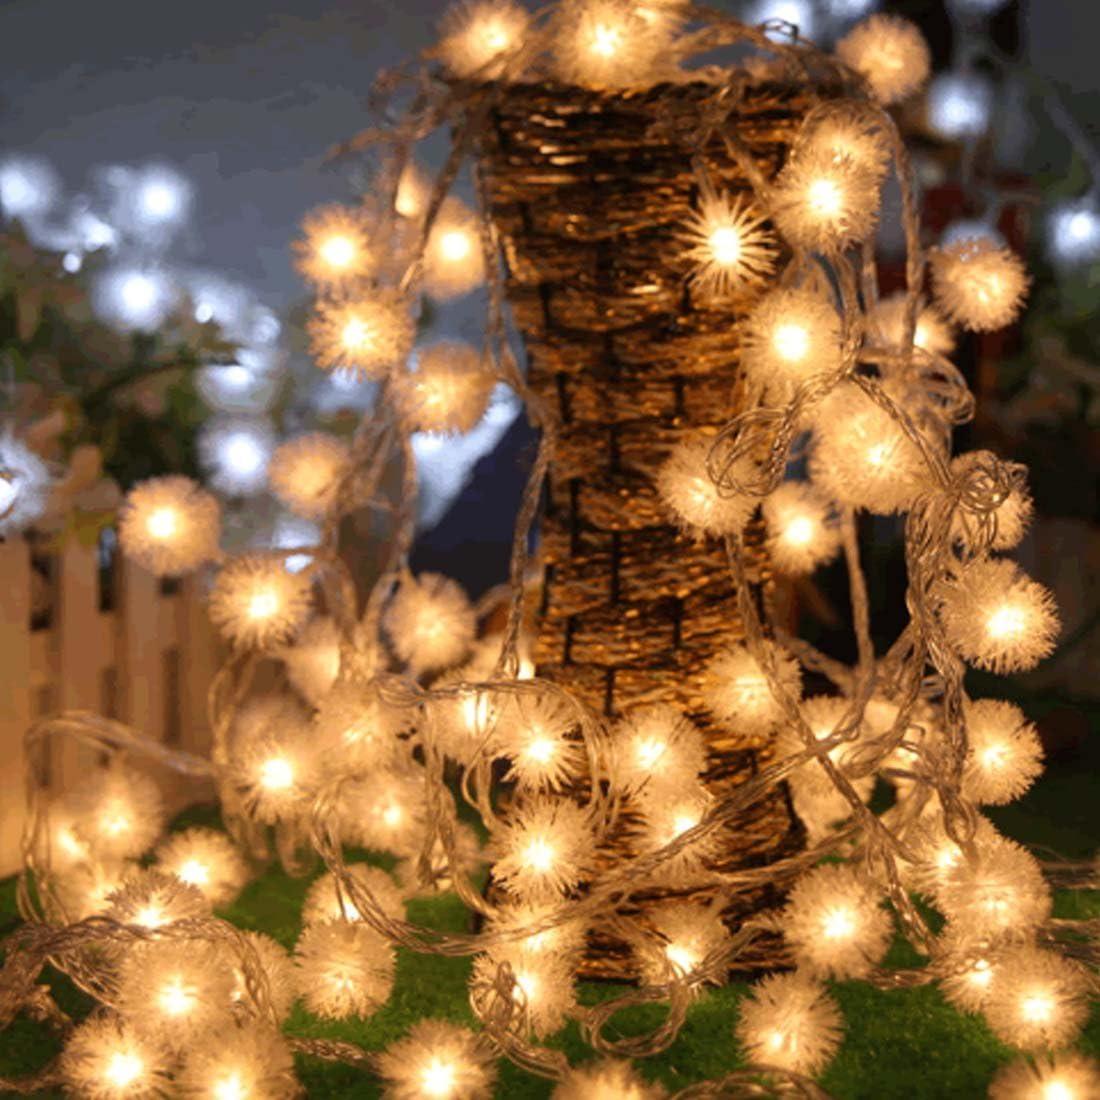 Dandelion Christmas Ball Lights String LED Twinkle Fairy Garland Battery Xmas